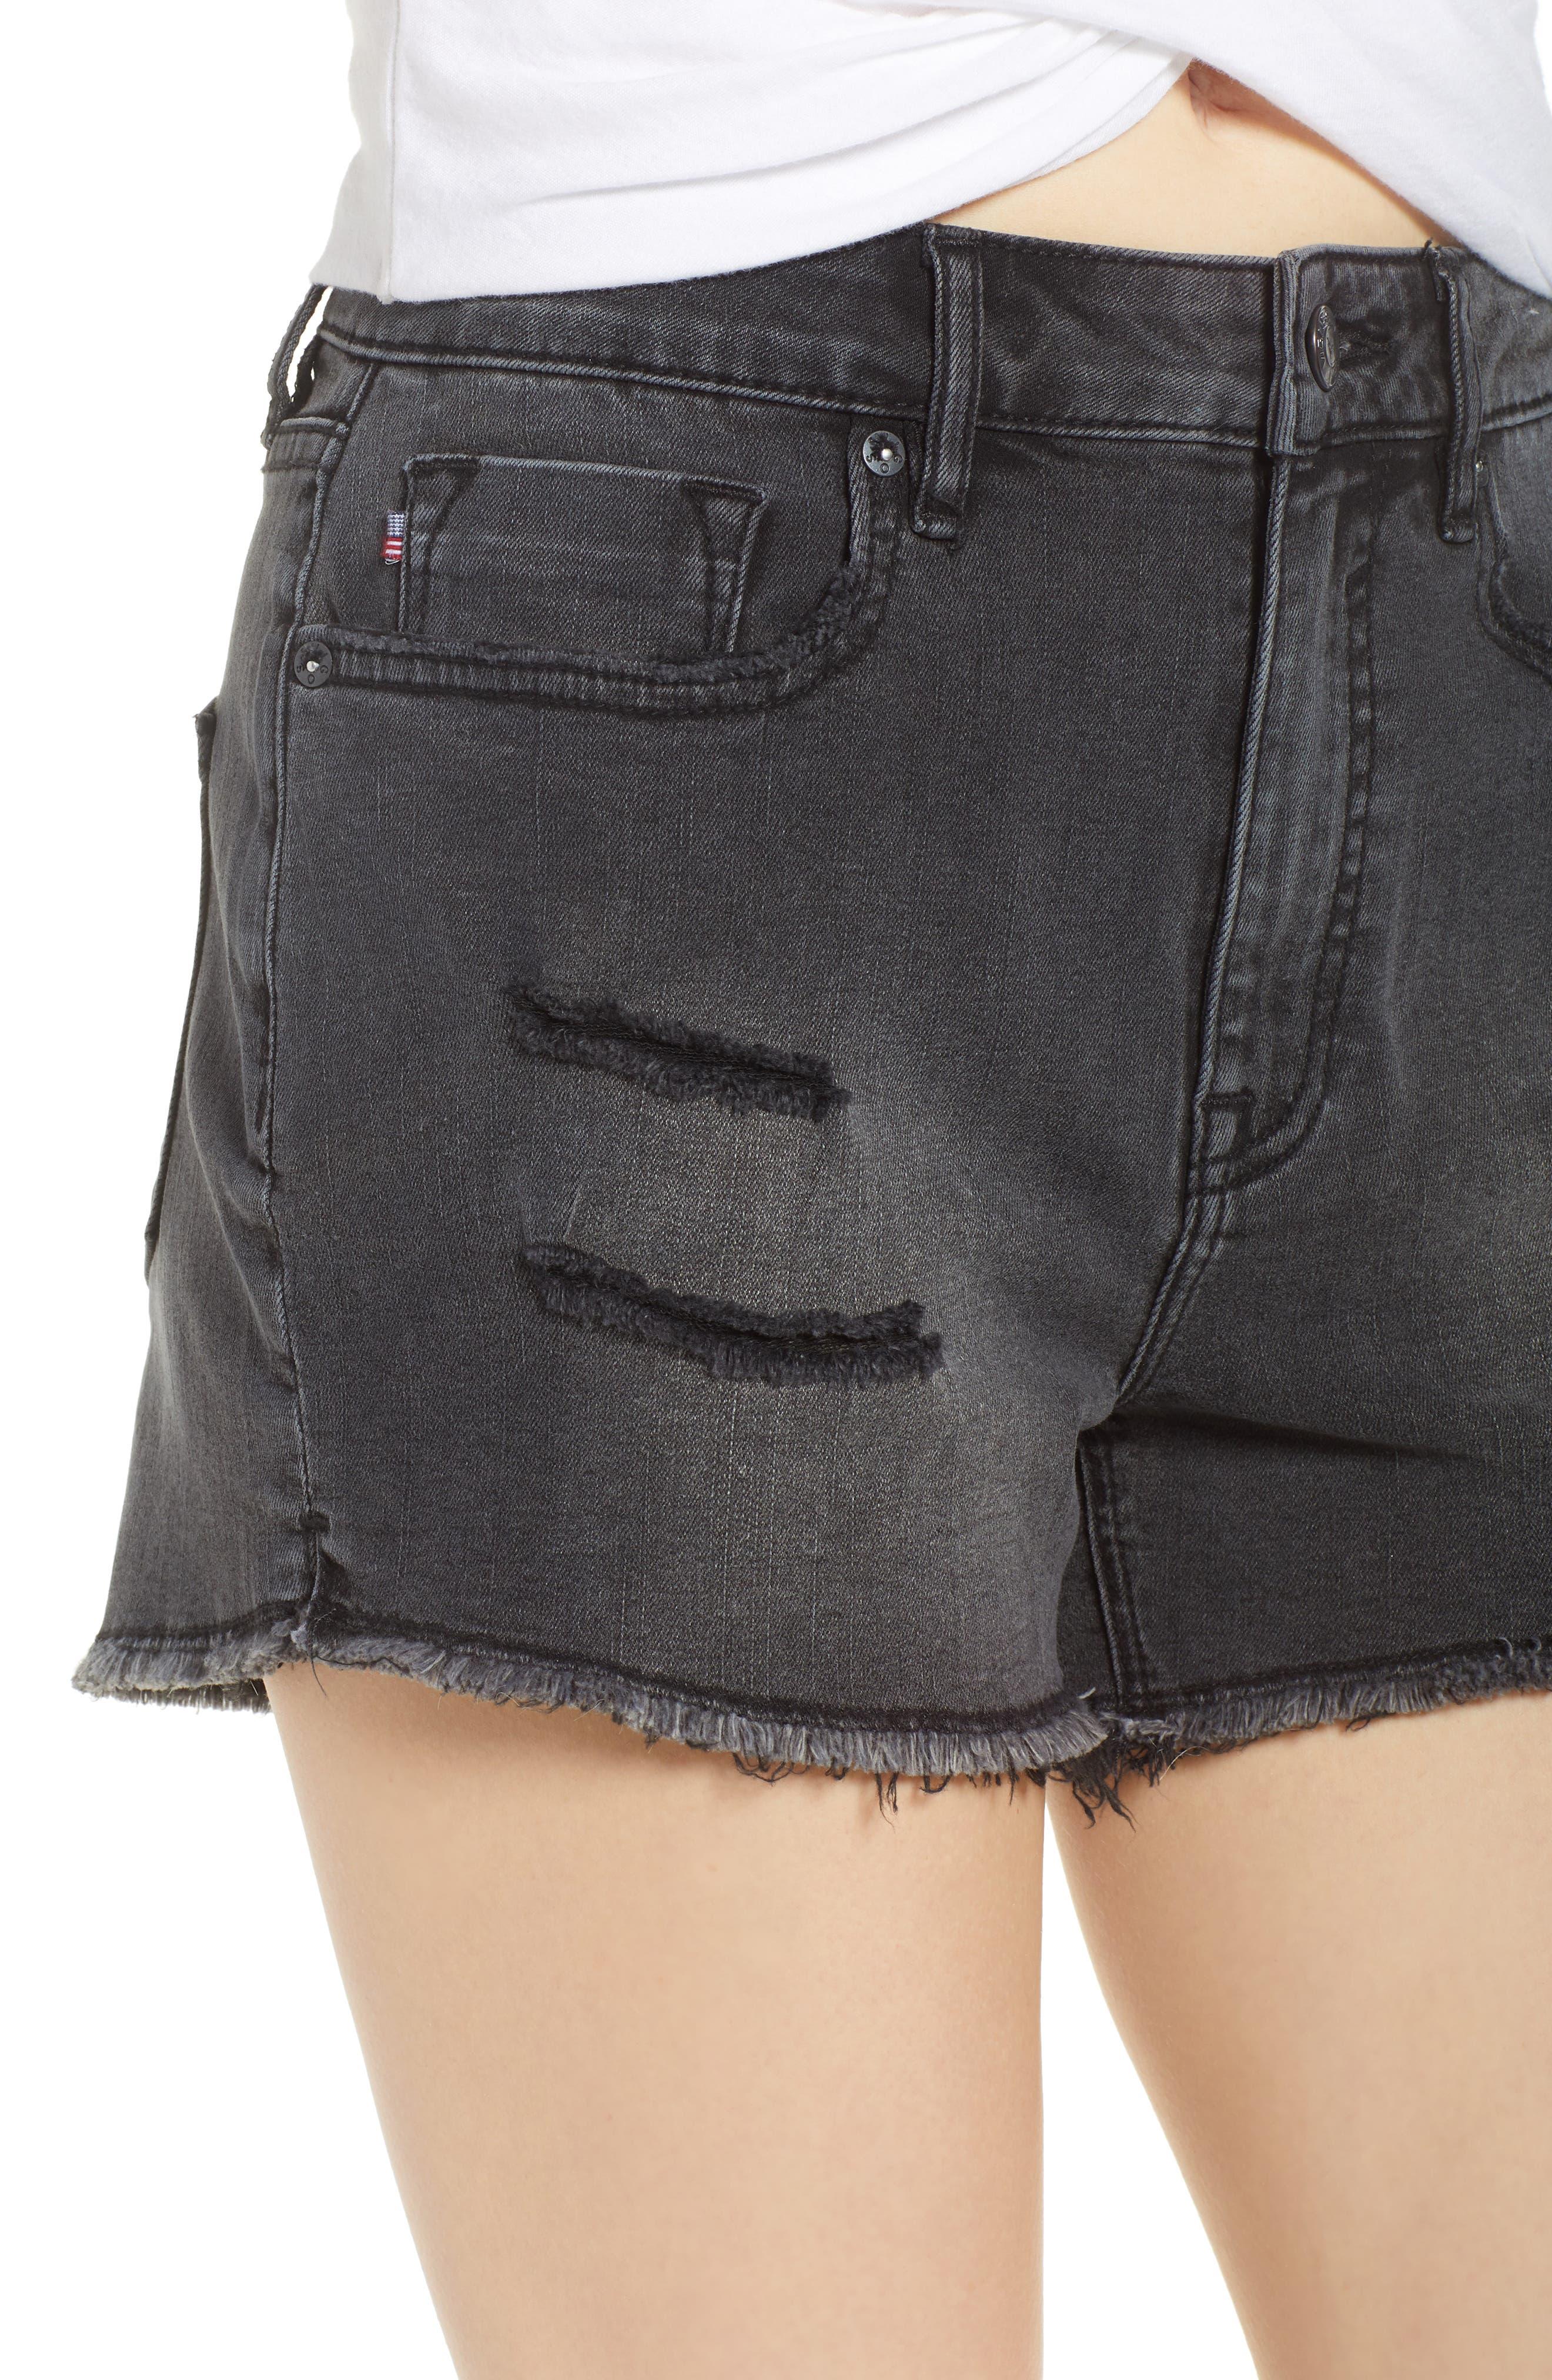 Jagger High Waist Denim Shorts,                             Alternate thumbnail 4, color,                             001